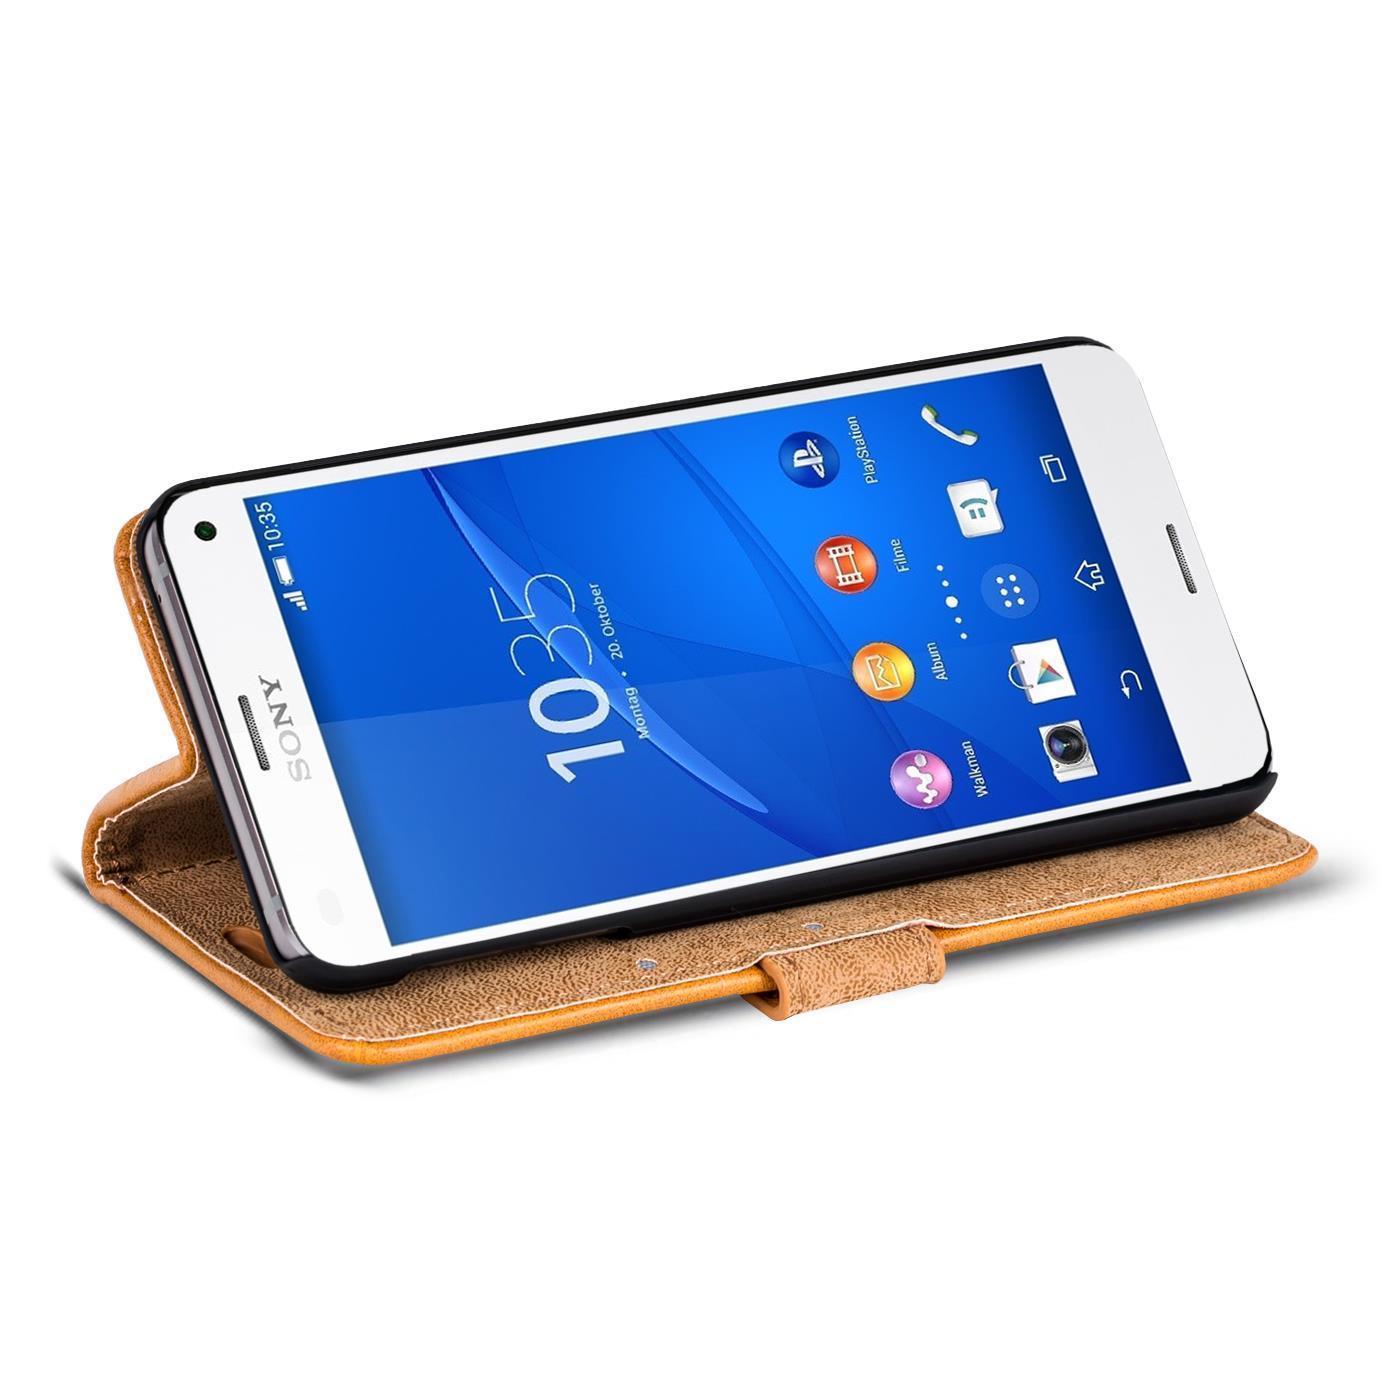 Retro Wallet Sony Xperia Z3 pact von Safers